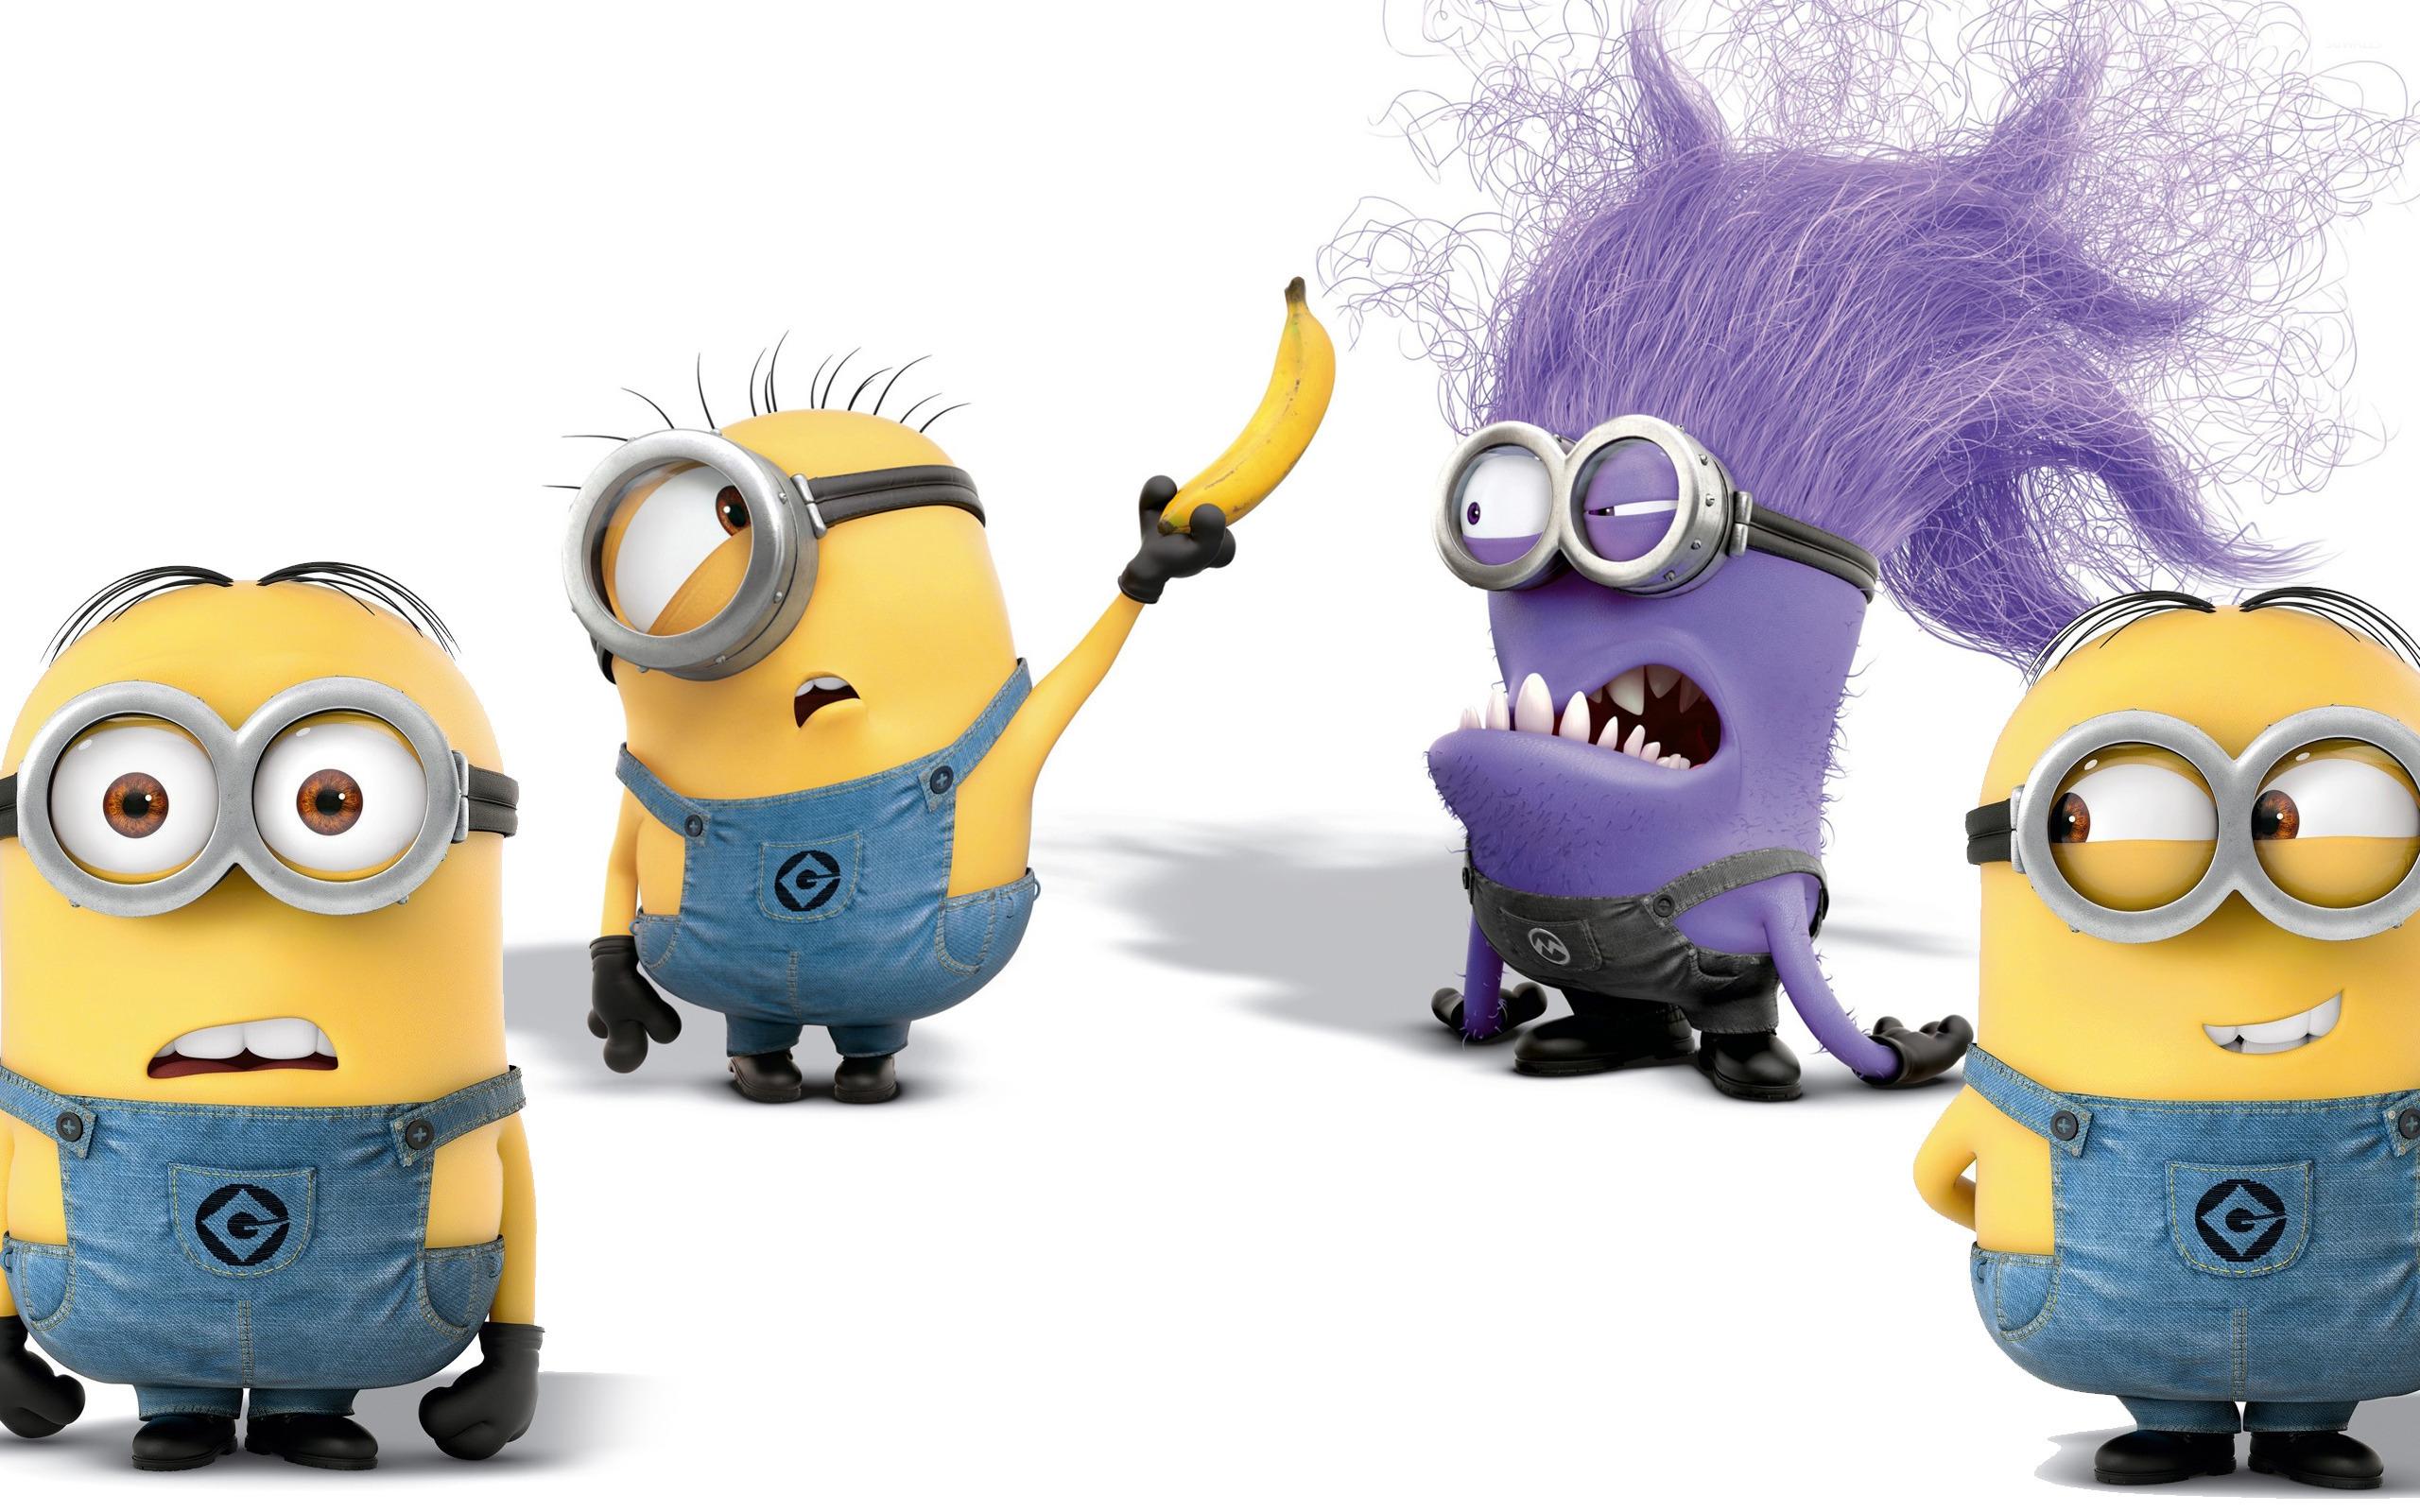 Minions - Despicable Me 2 [3] wallpaper - Cartoon wallpapers - #22546